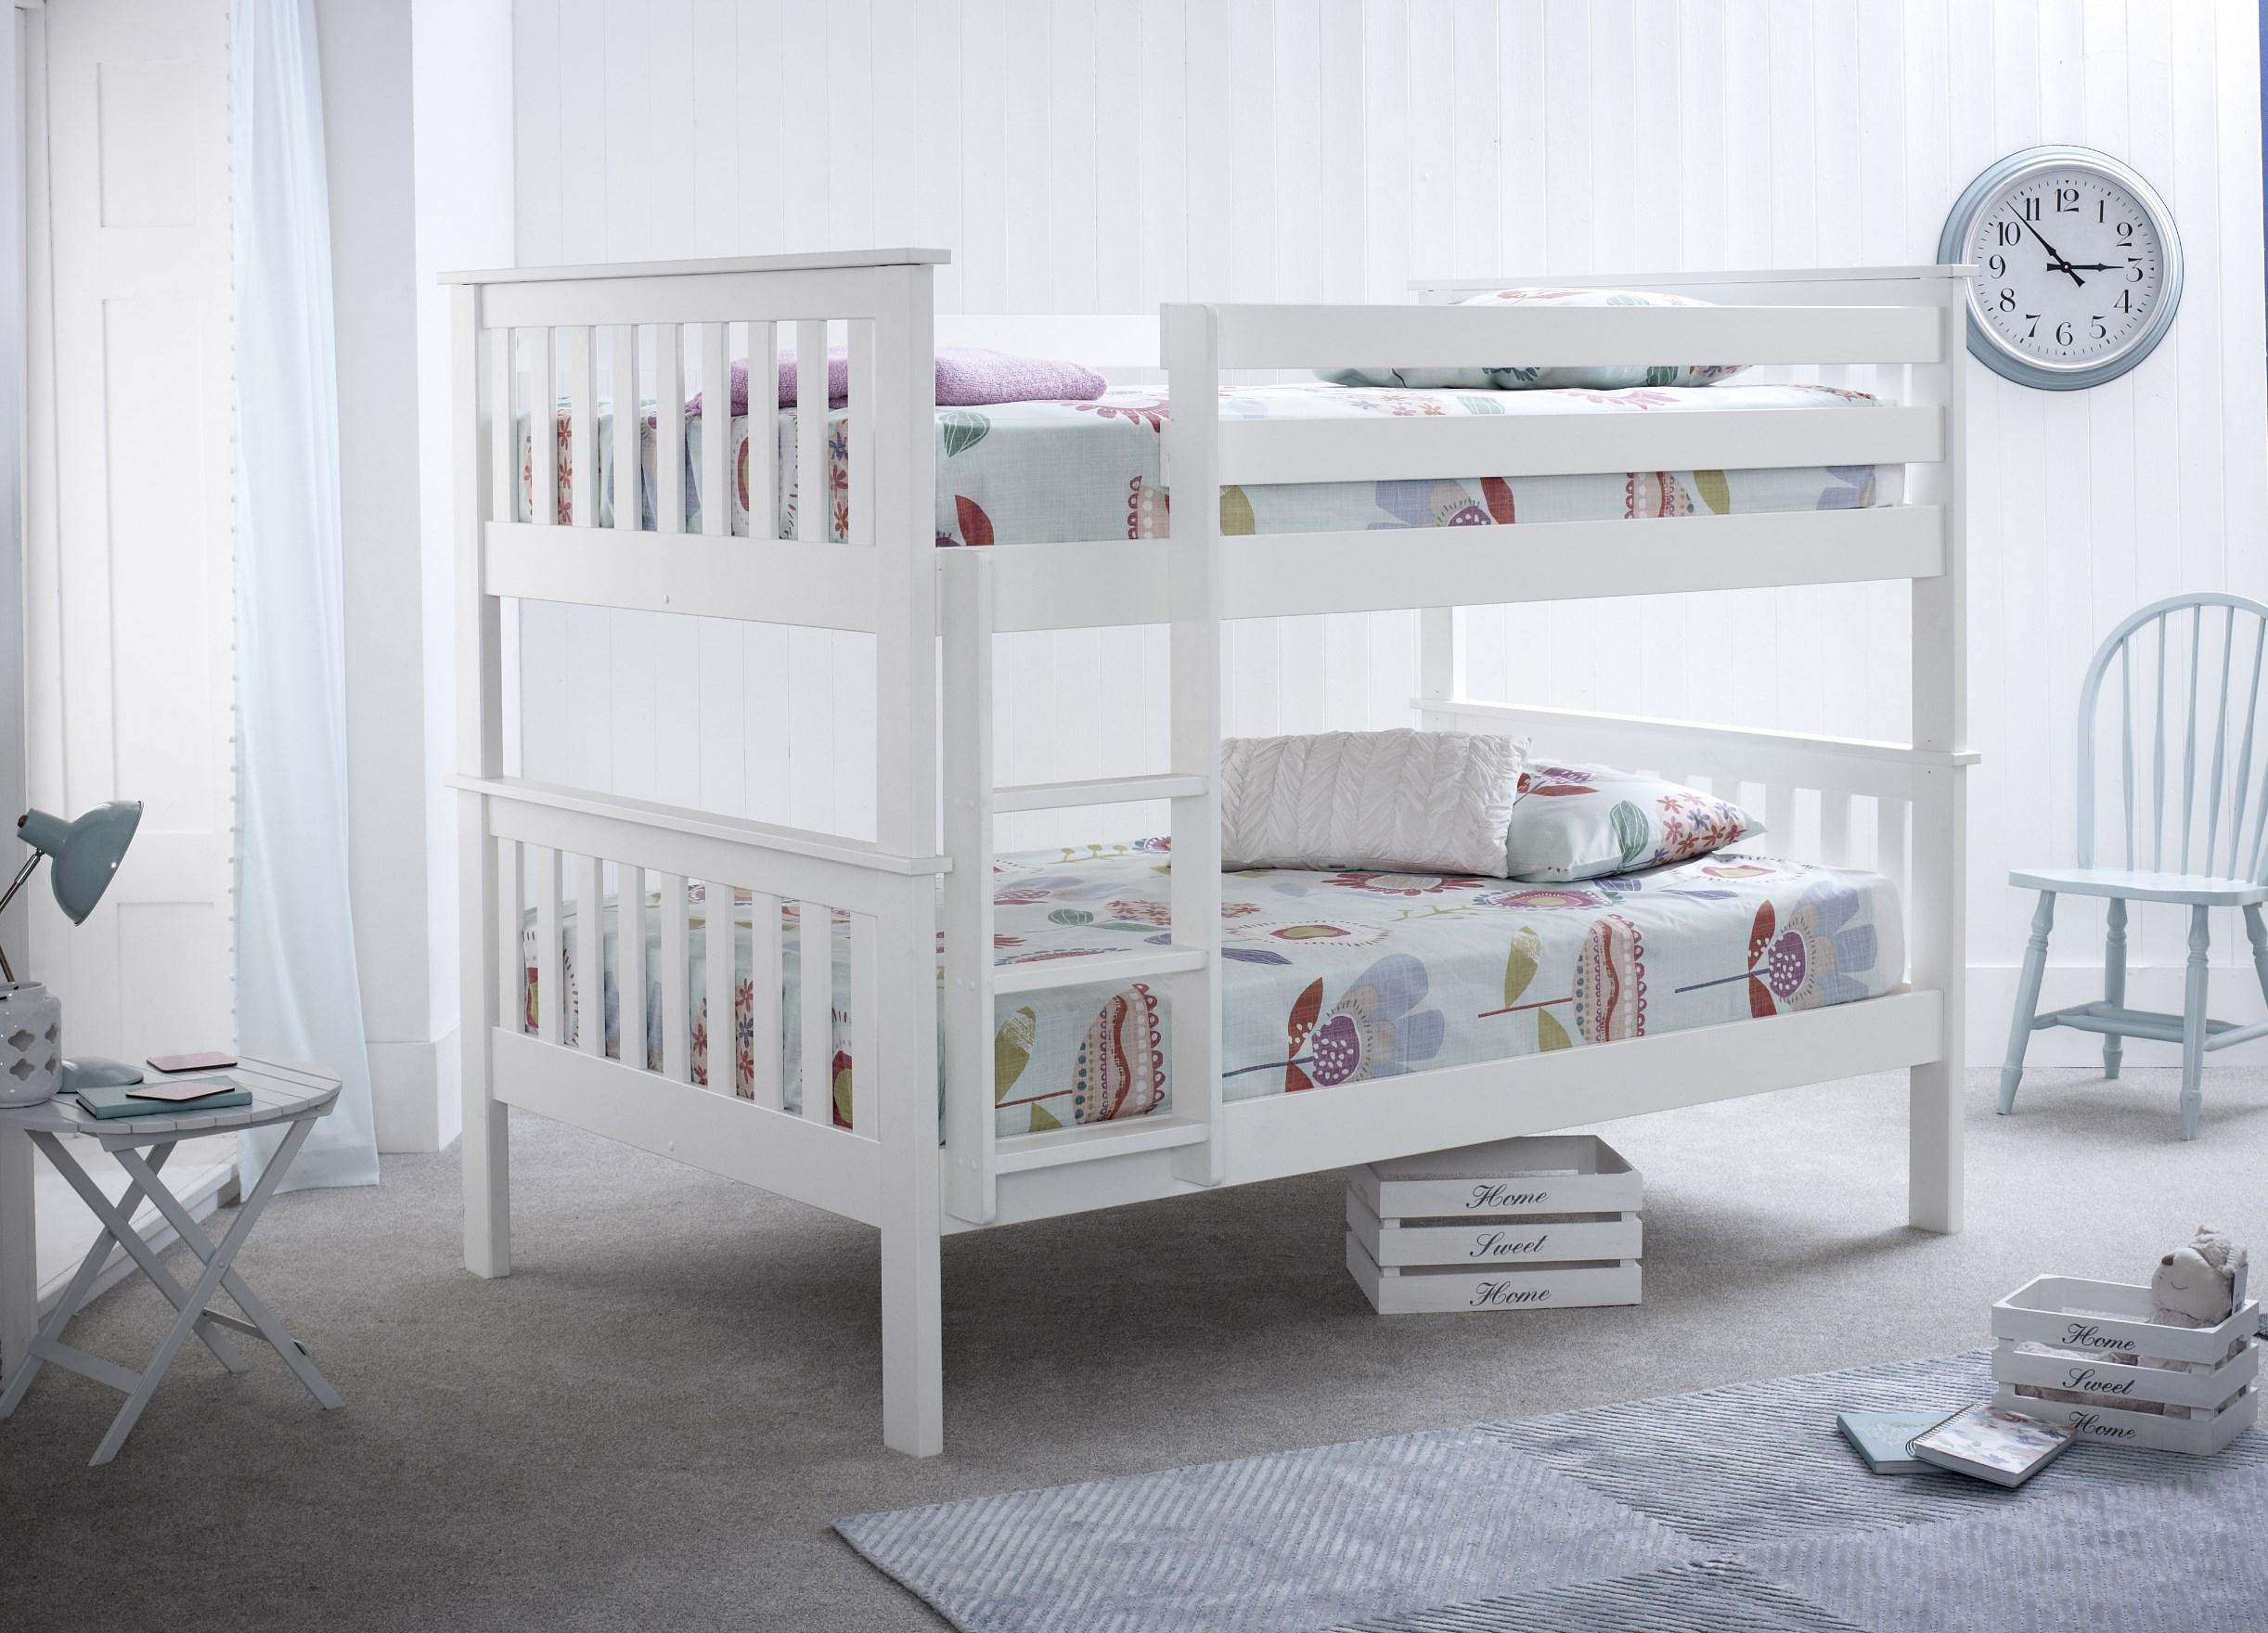 100% authentic 617b4 069ec 4ft + 4ft Double Bunk Bed. White Wood Double over Double Bunk Bed Set